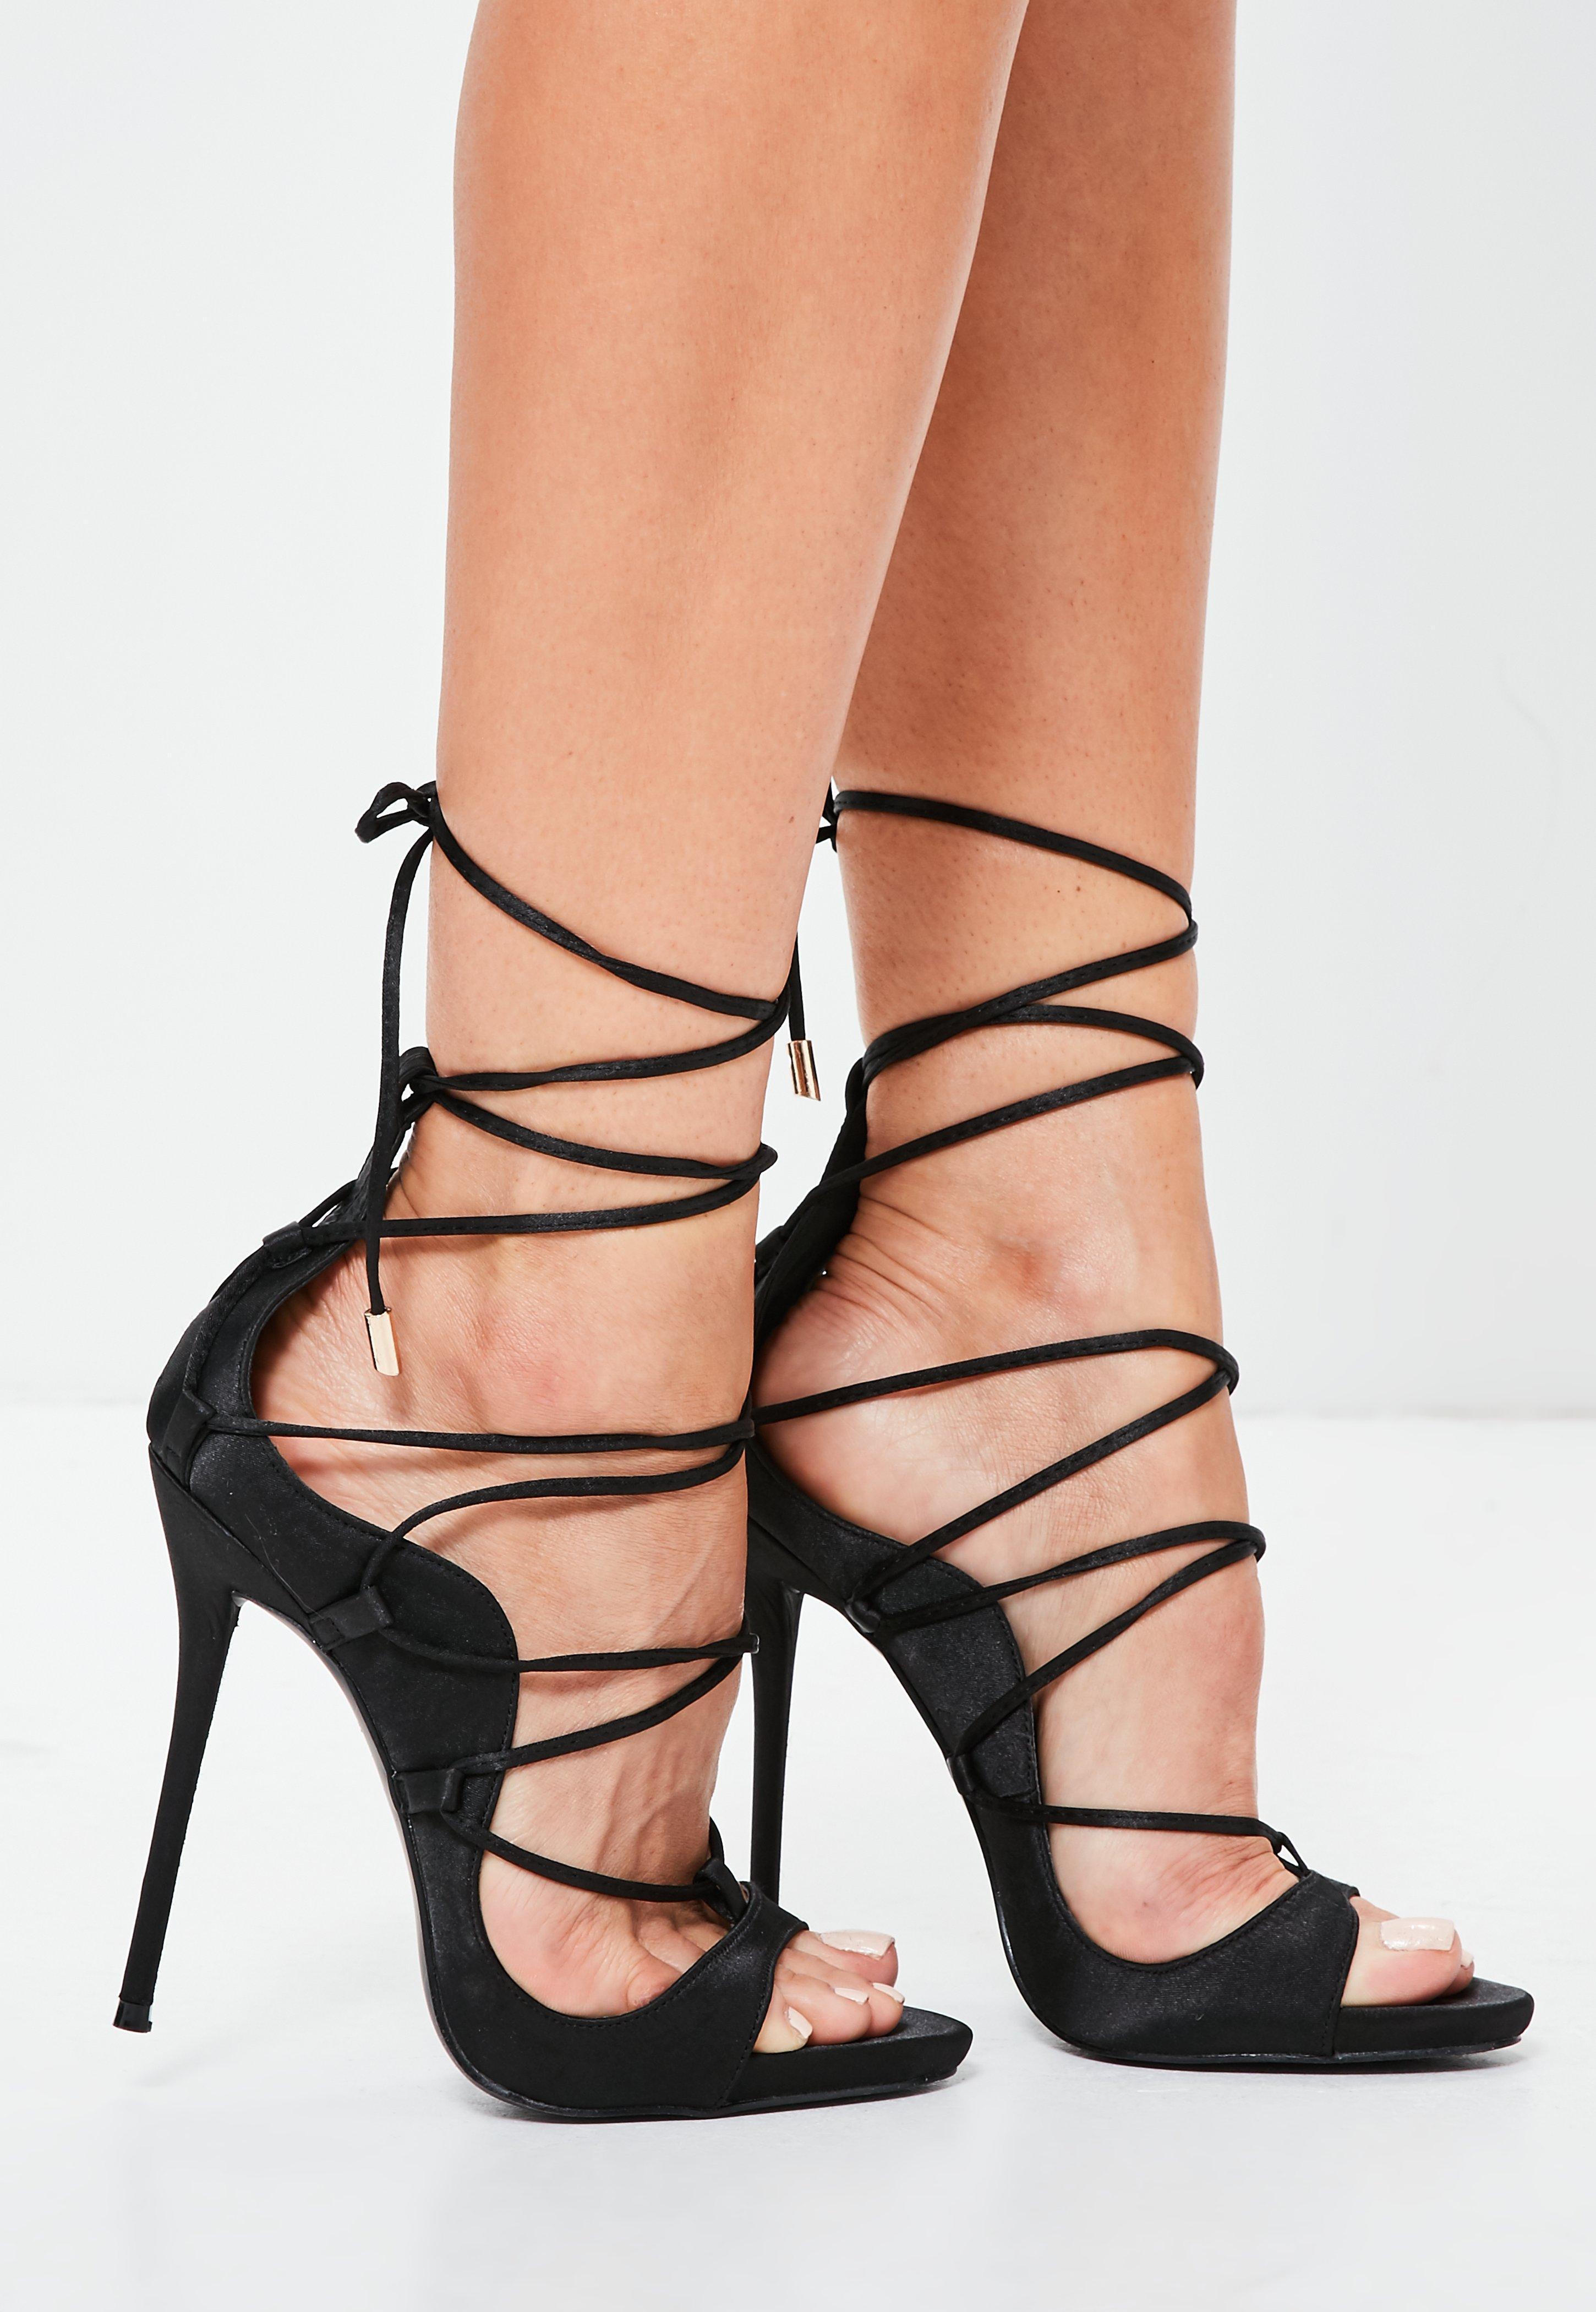 906029a48f64 Missguided Black Satin Gladiator Sandals in Black - Lyst